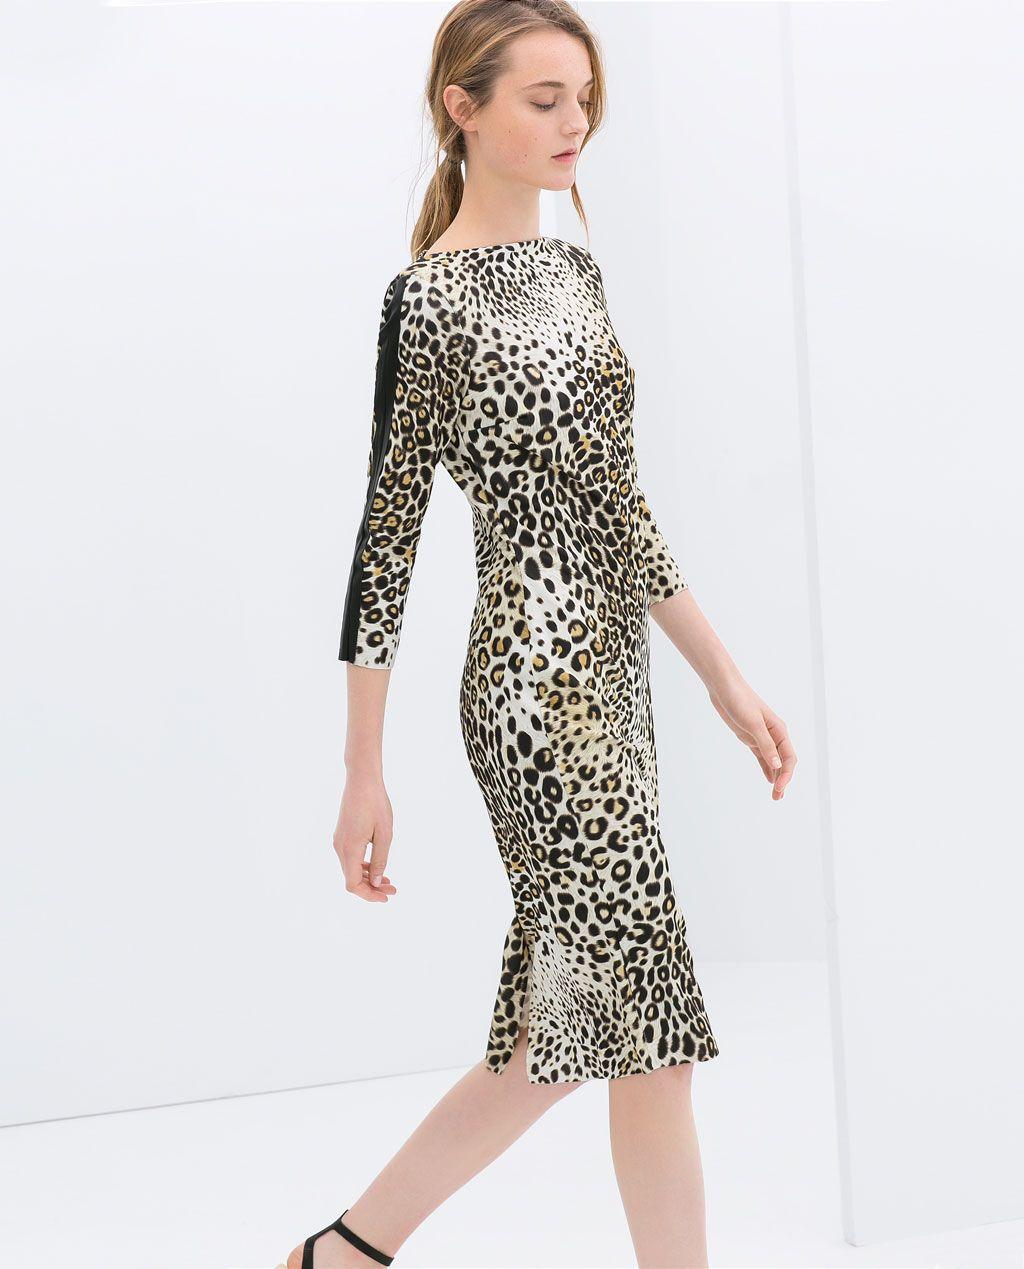 Beauty Fashion Group: COMBINED LEOPARD PRINT DRESS From Zara